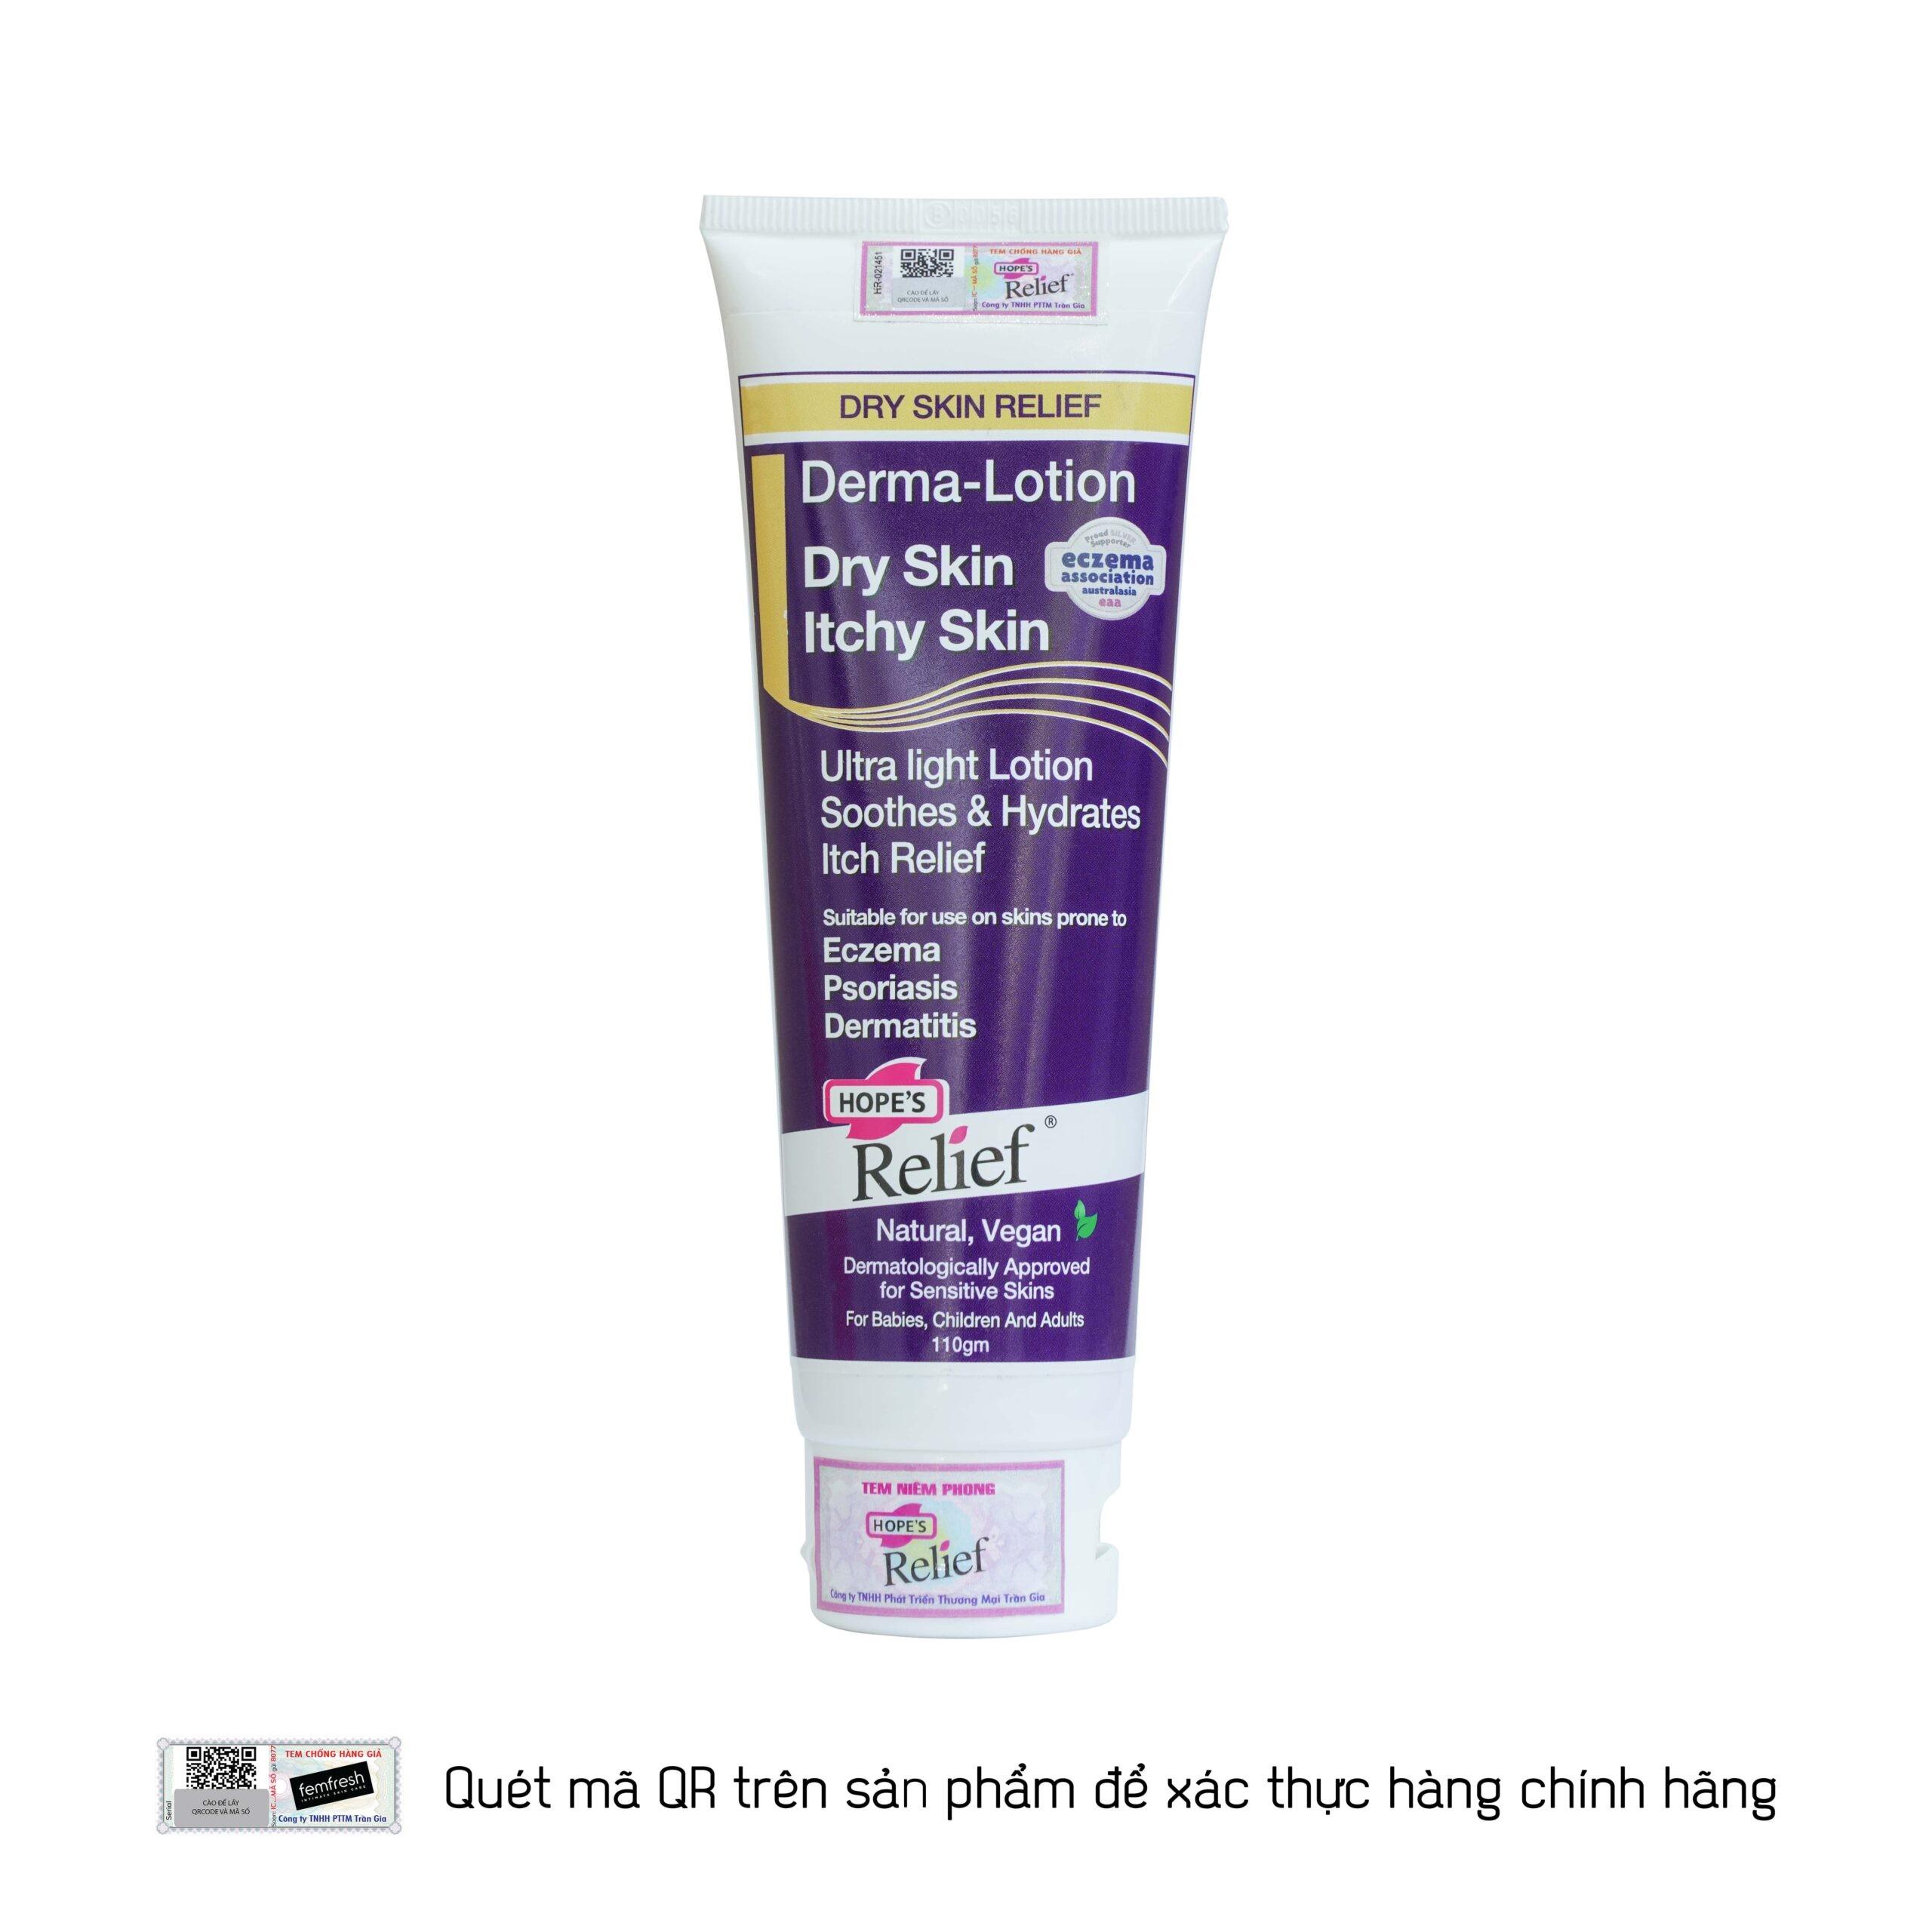 Kem dưỡng ẩm Hope's Relief Derma-Lotion 110g